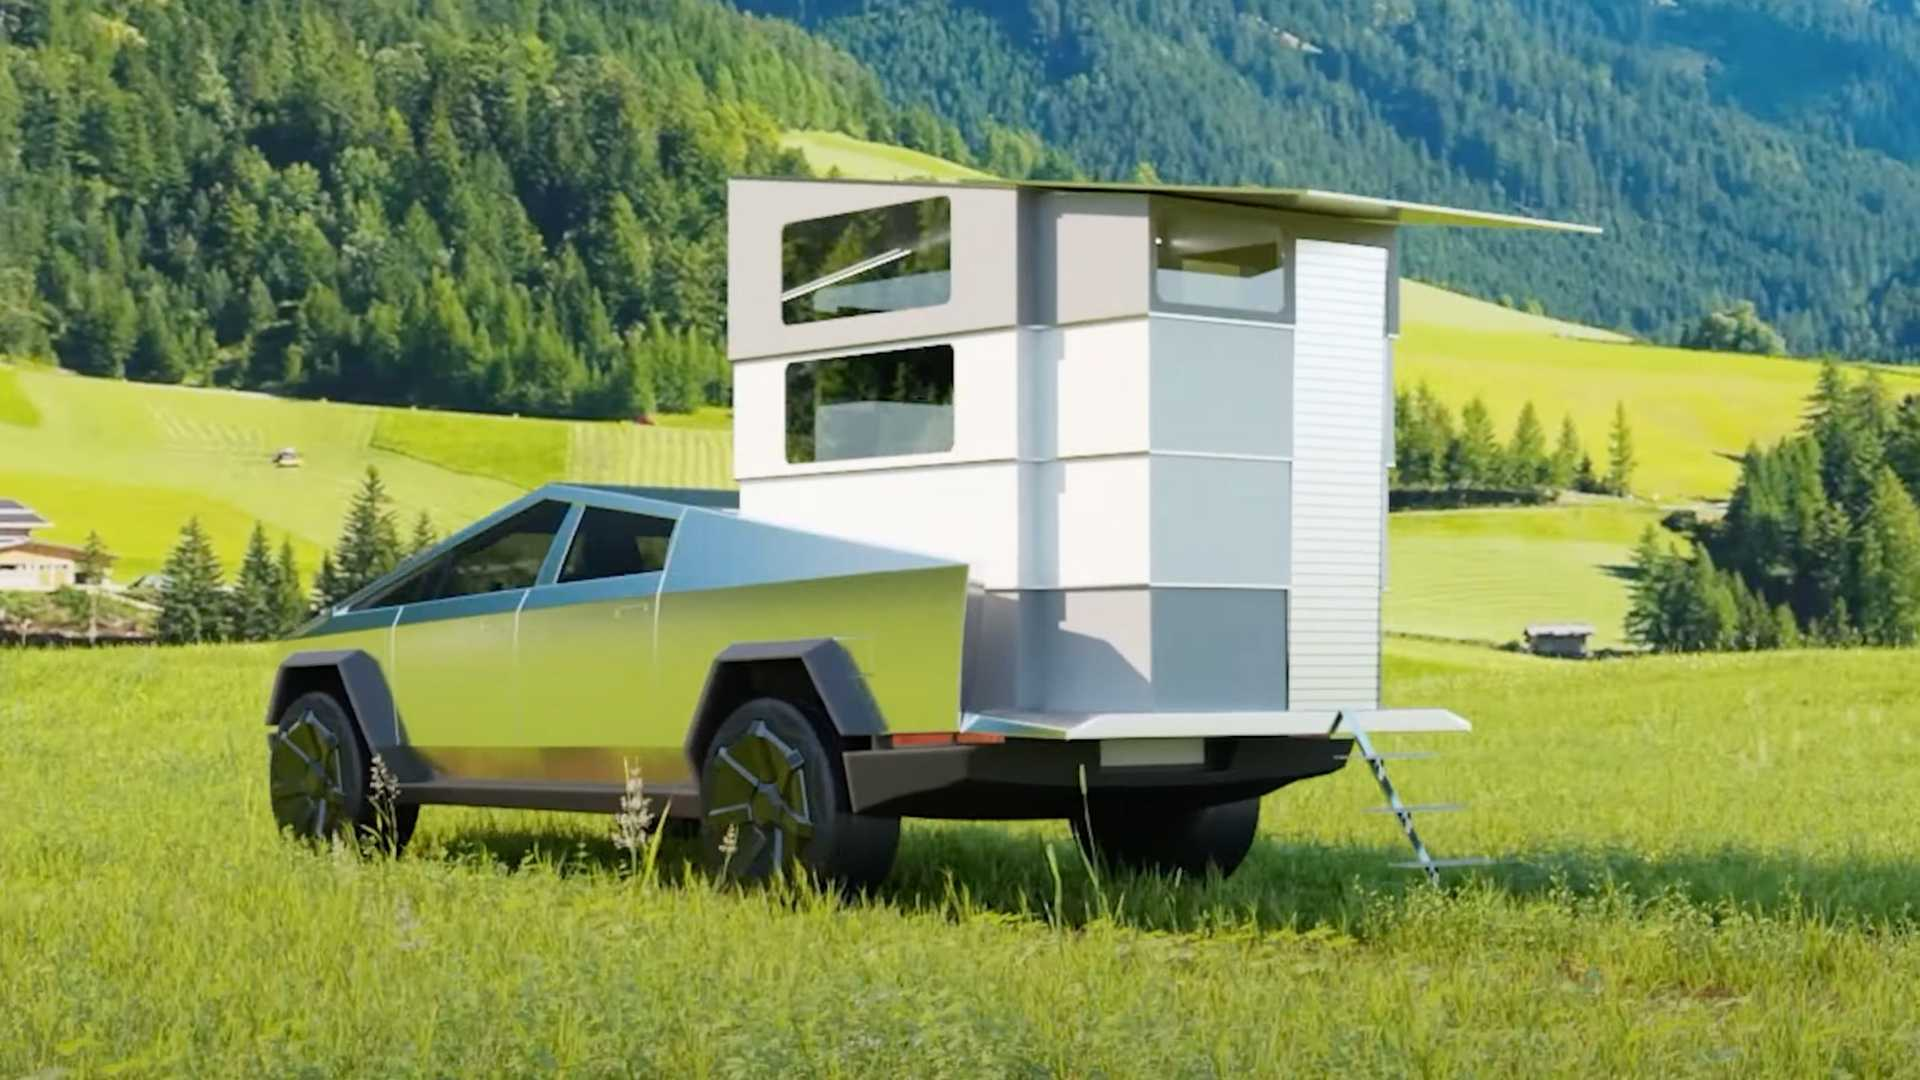 https://cdn.motor1.com/images/mgl/x7GkP/s6/cyberlandr-truck-camper-for-tesla-cybertruck.jpg